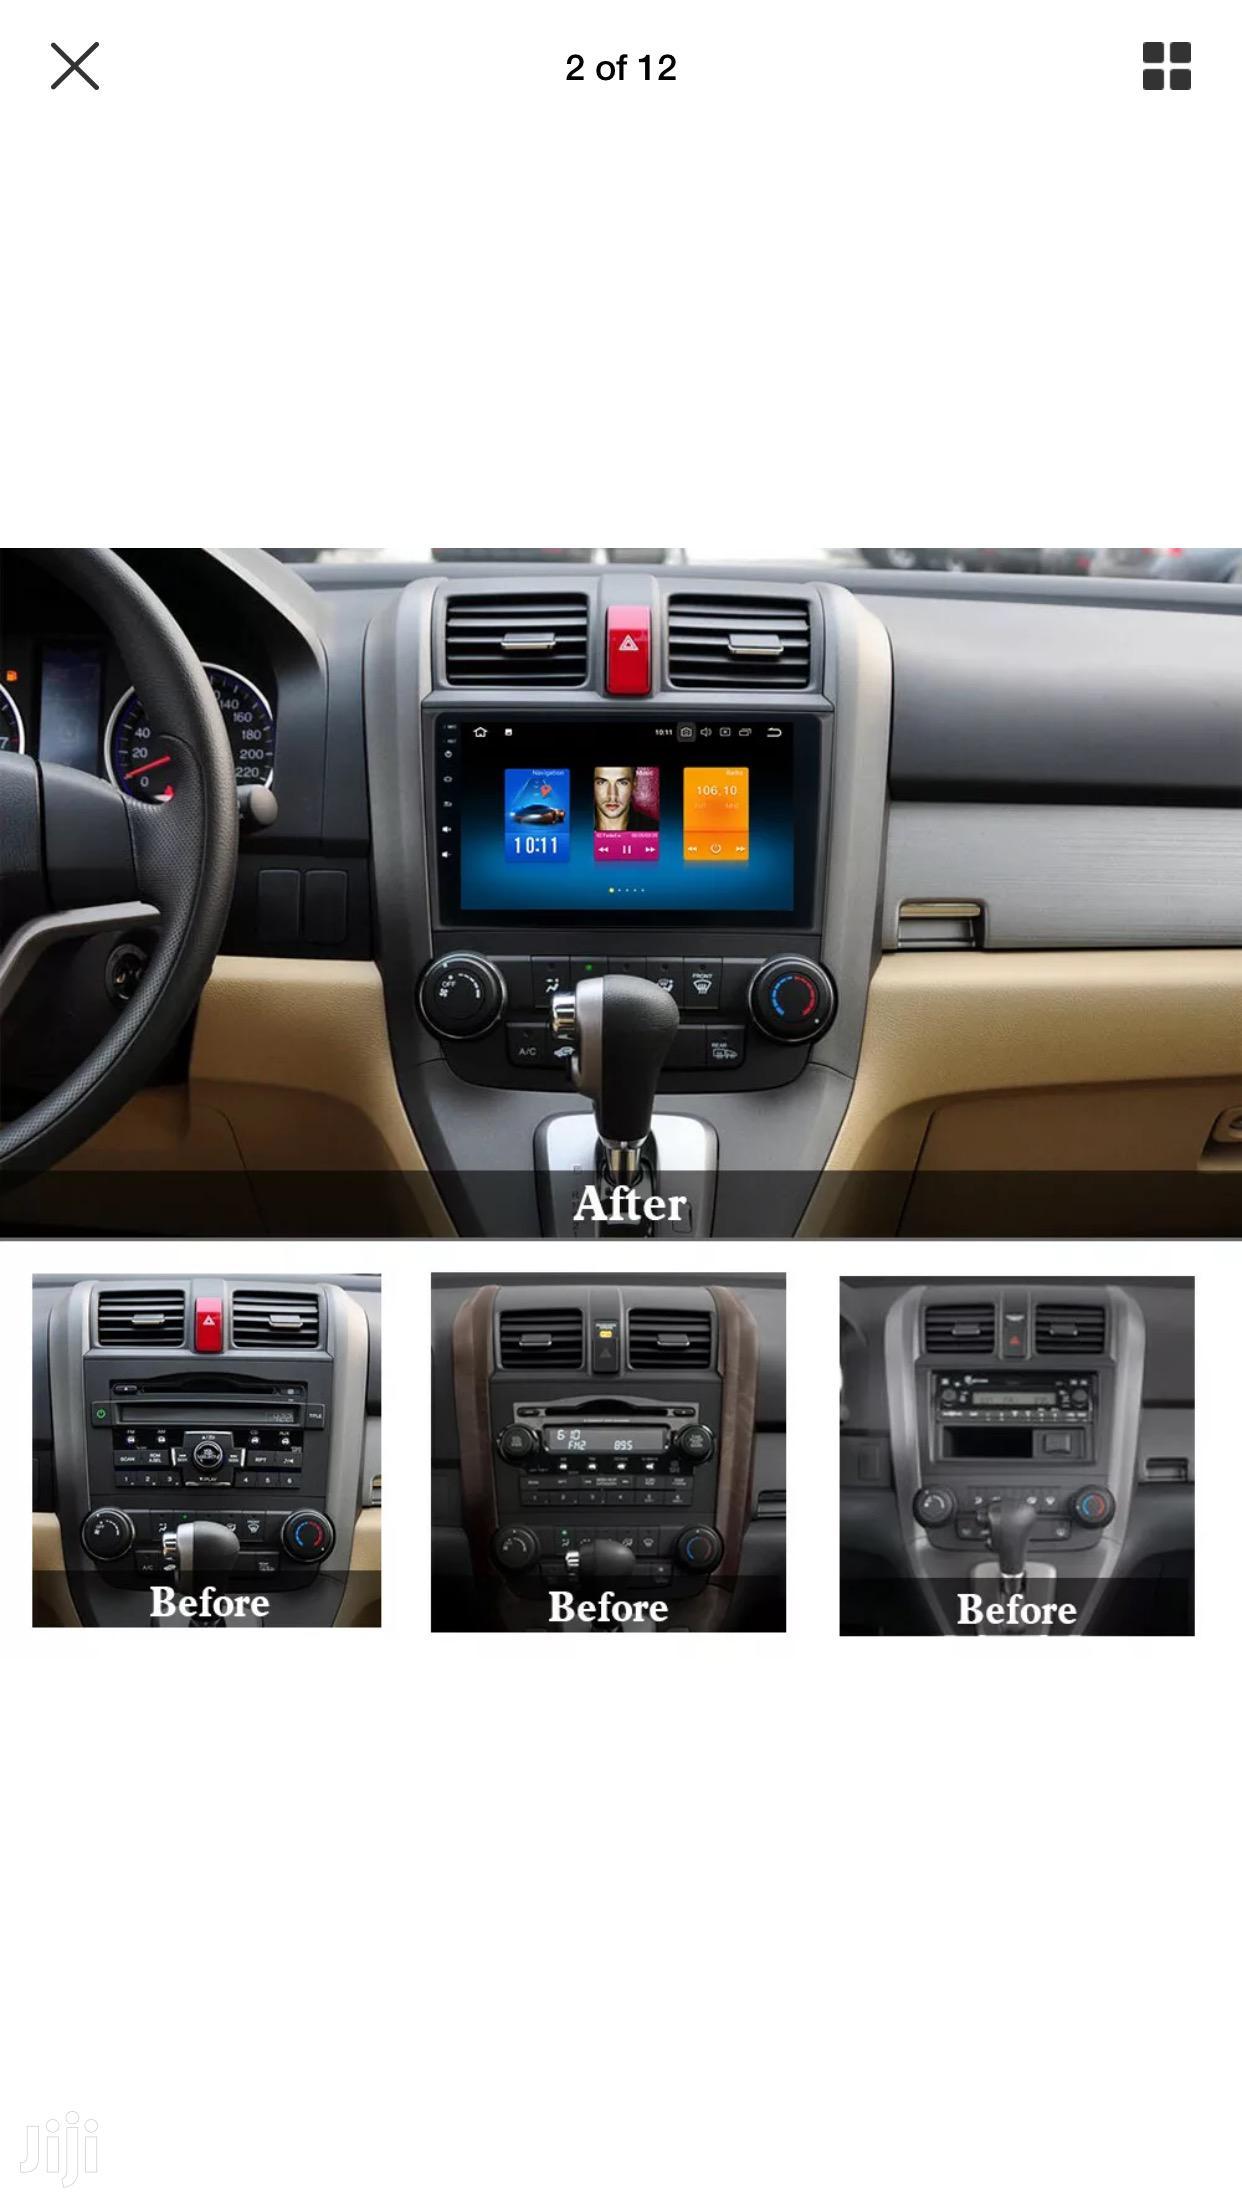 CRV Honda 2006 TO 2011 Android GPS Navigation Car Player